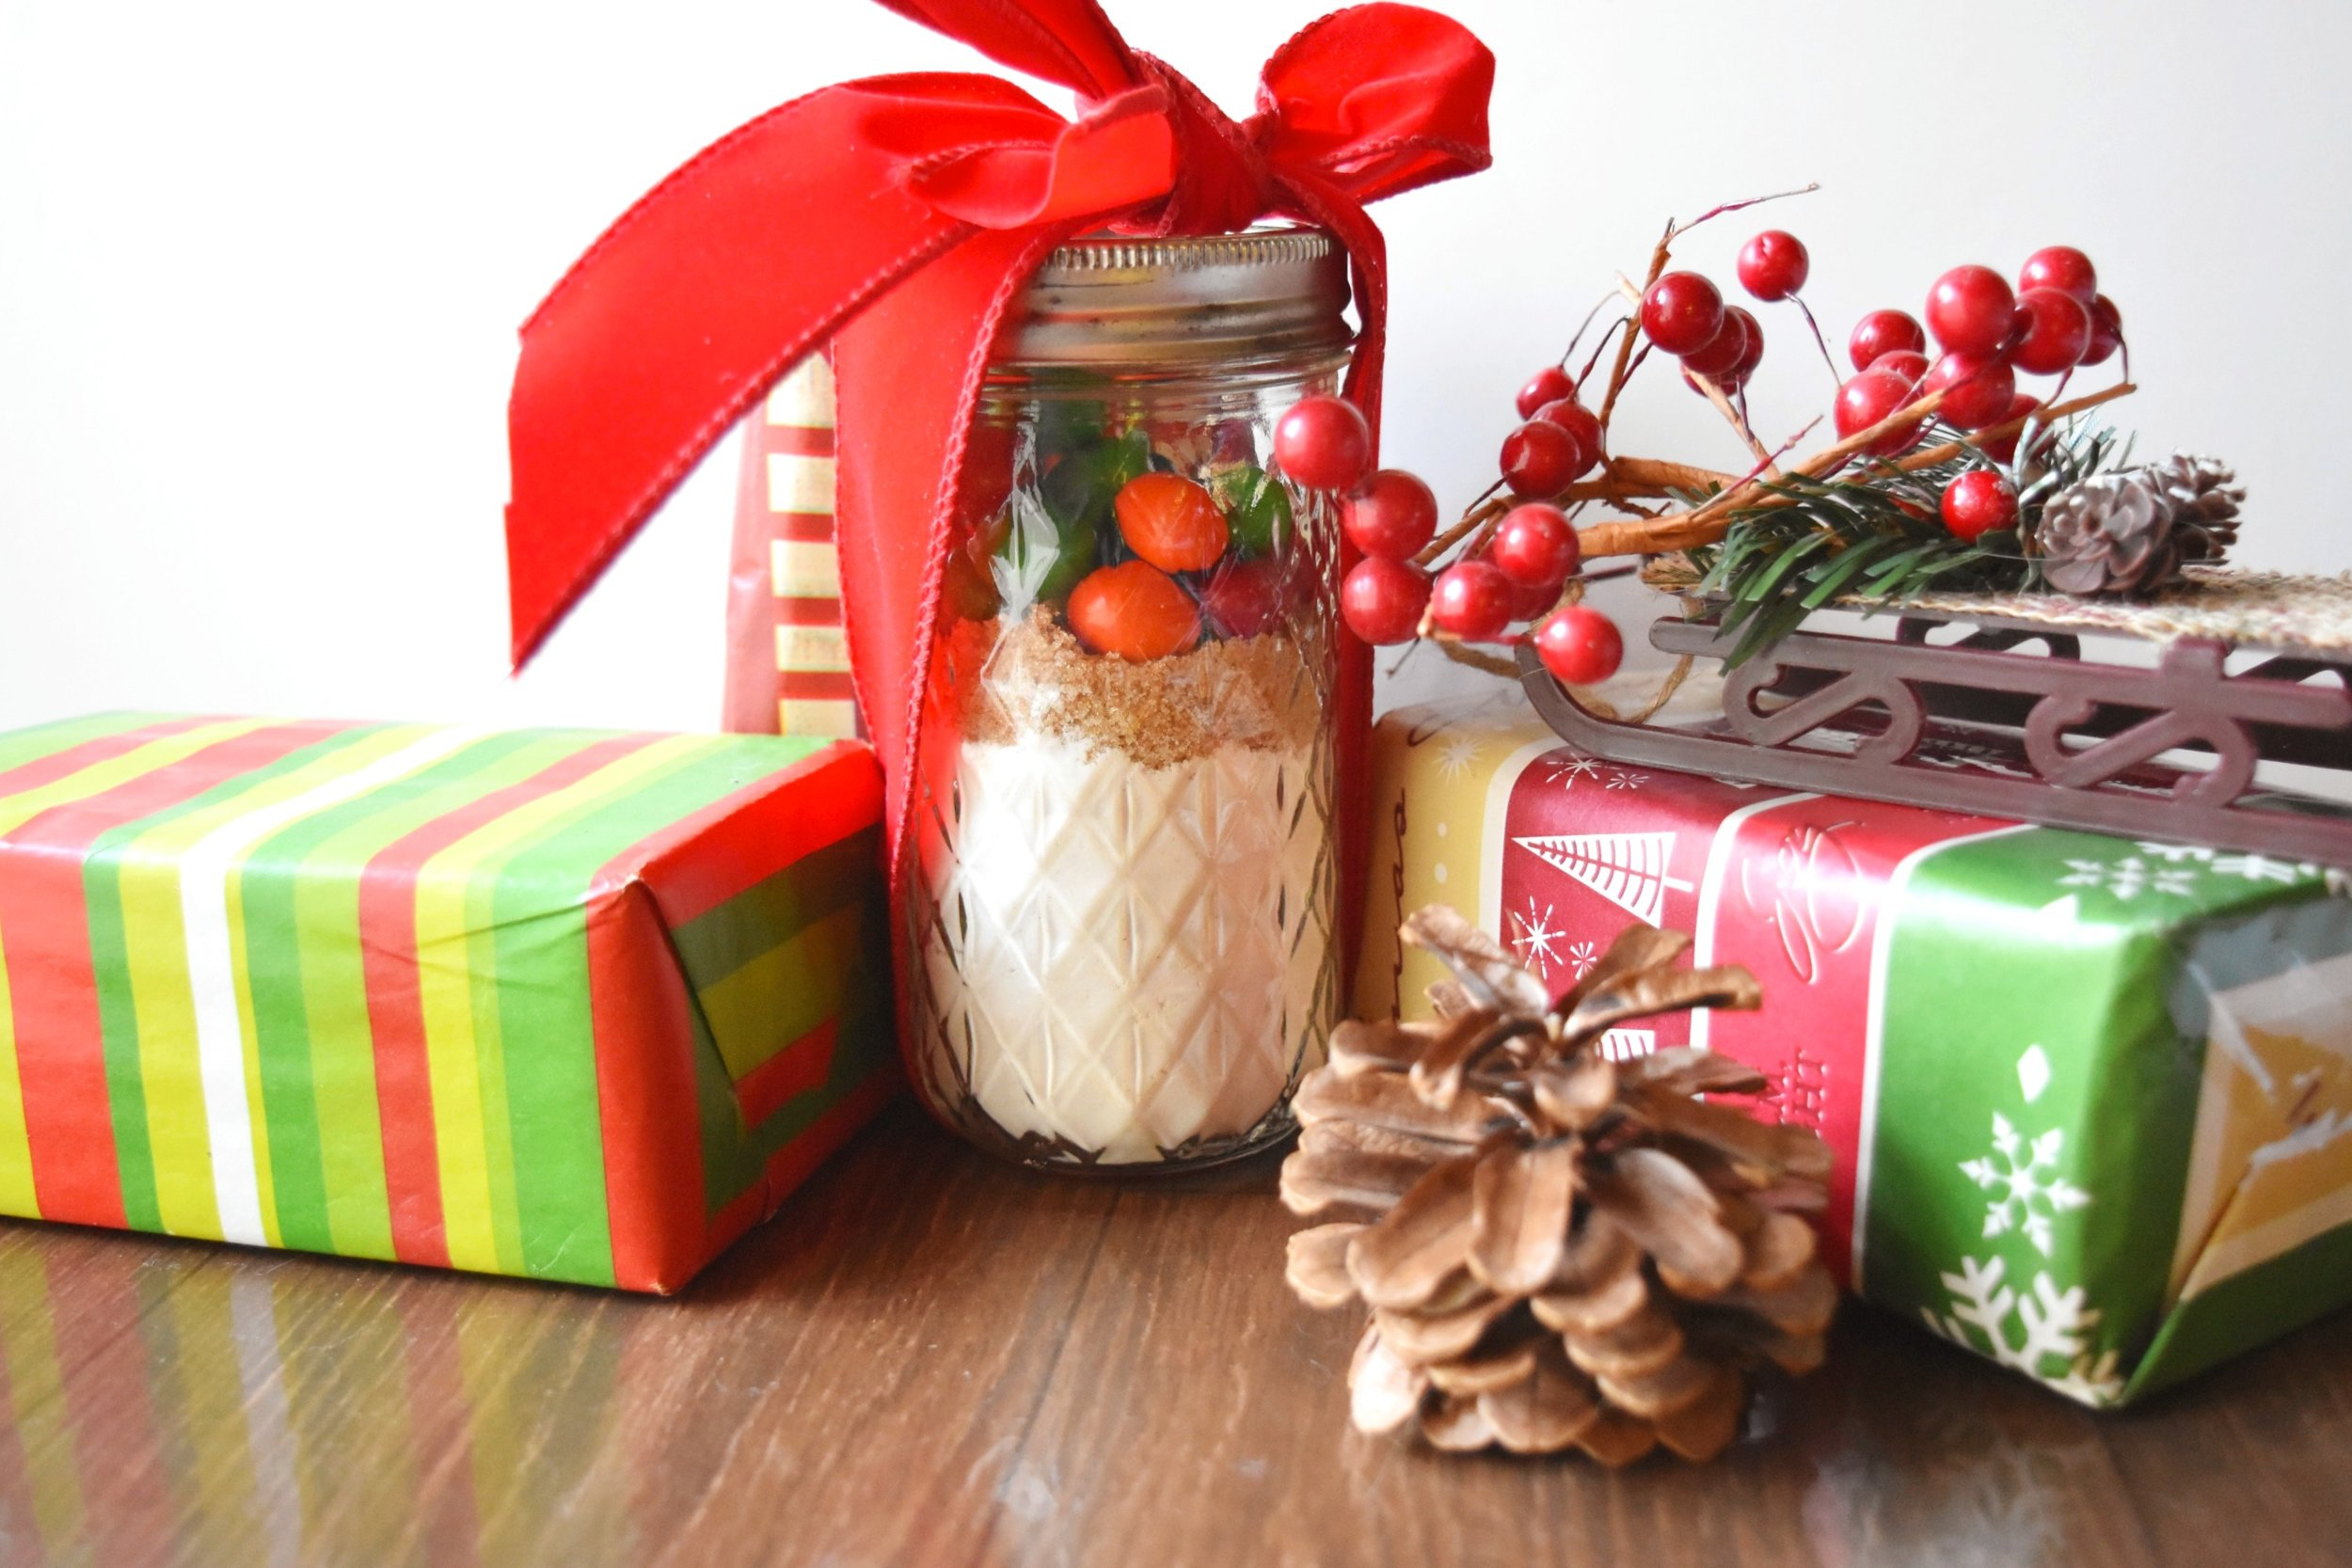 Festive Cookie Mix in a Jar.jpg